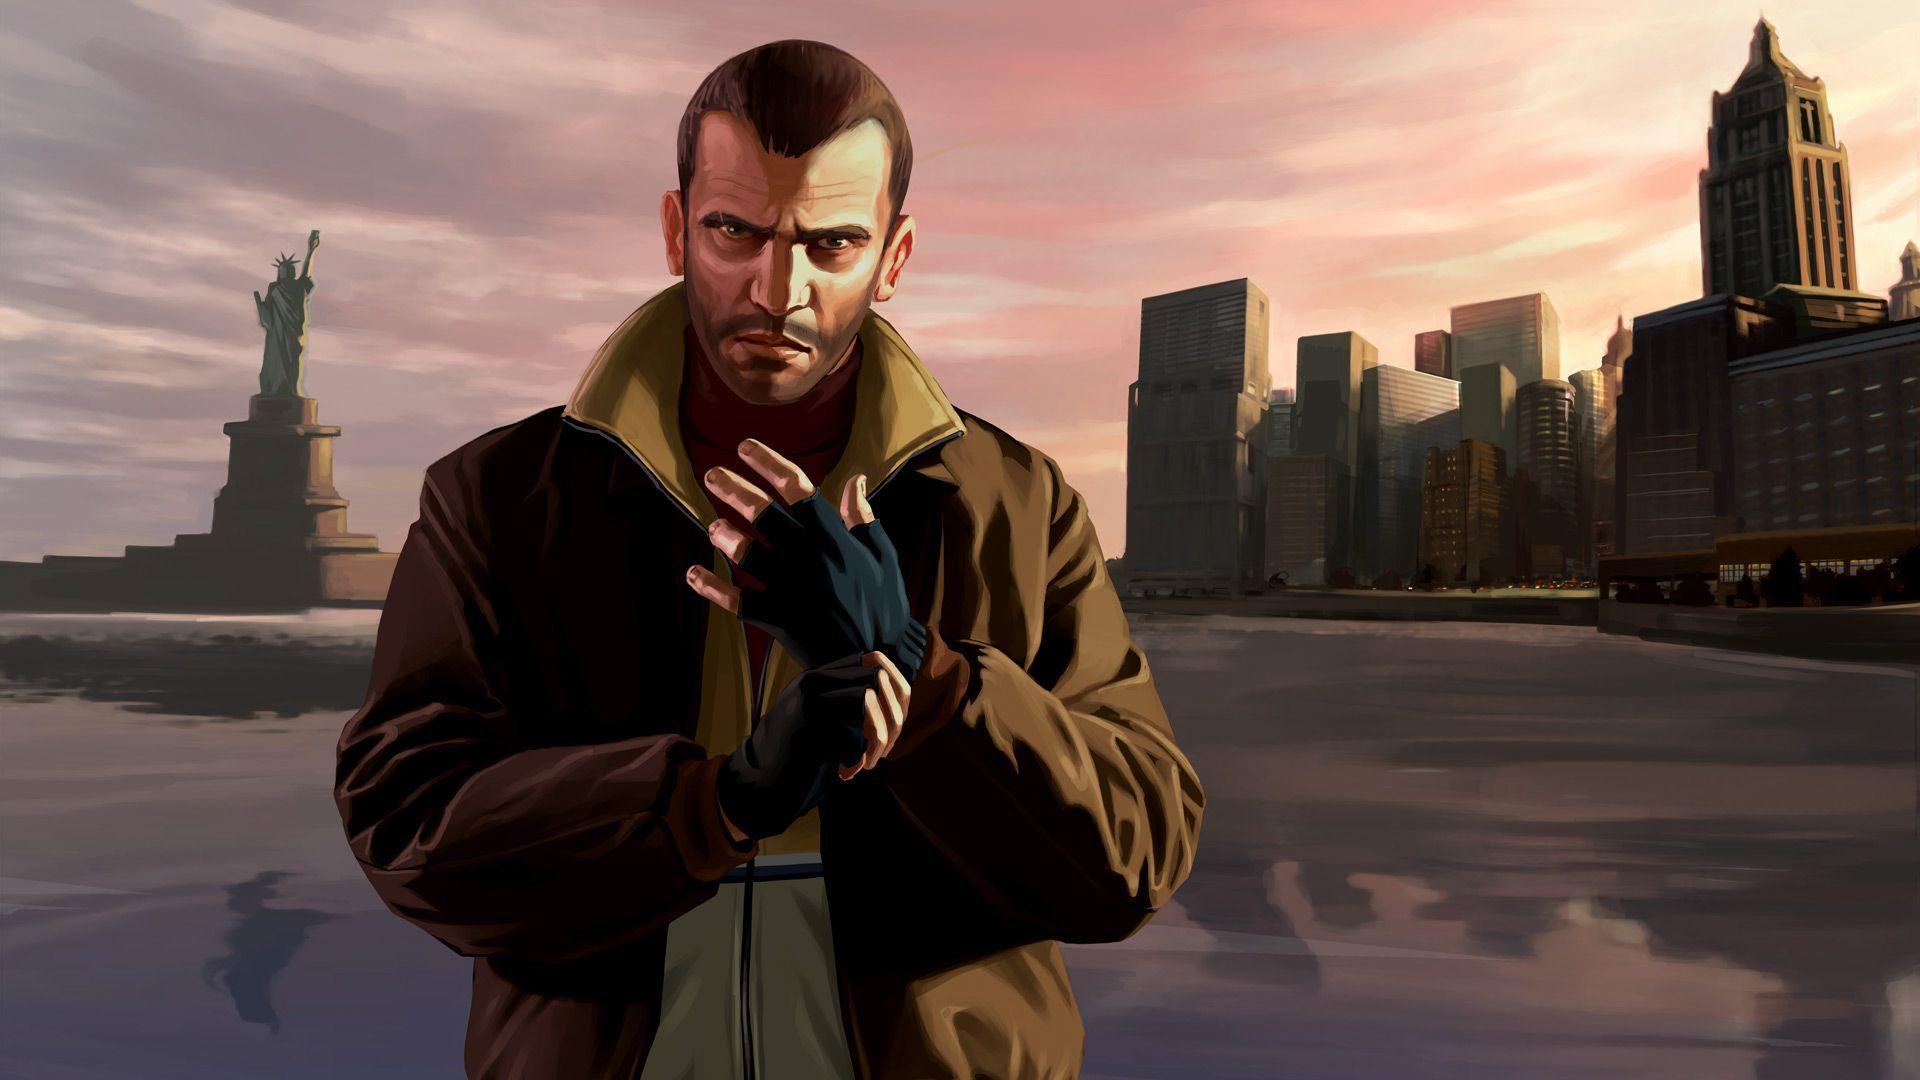 Grand Theft Auto Iv Wallpaper グランドセフトオート オート